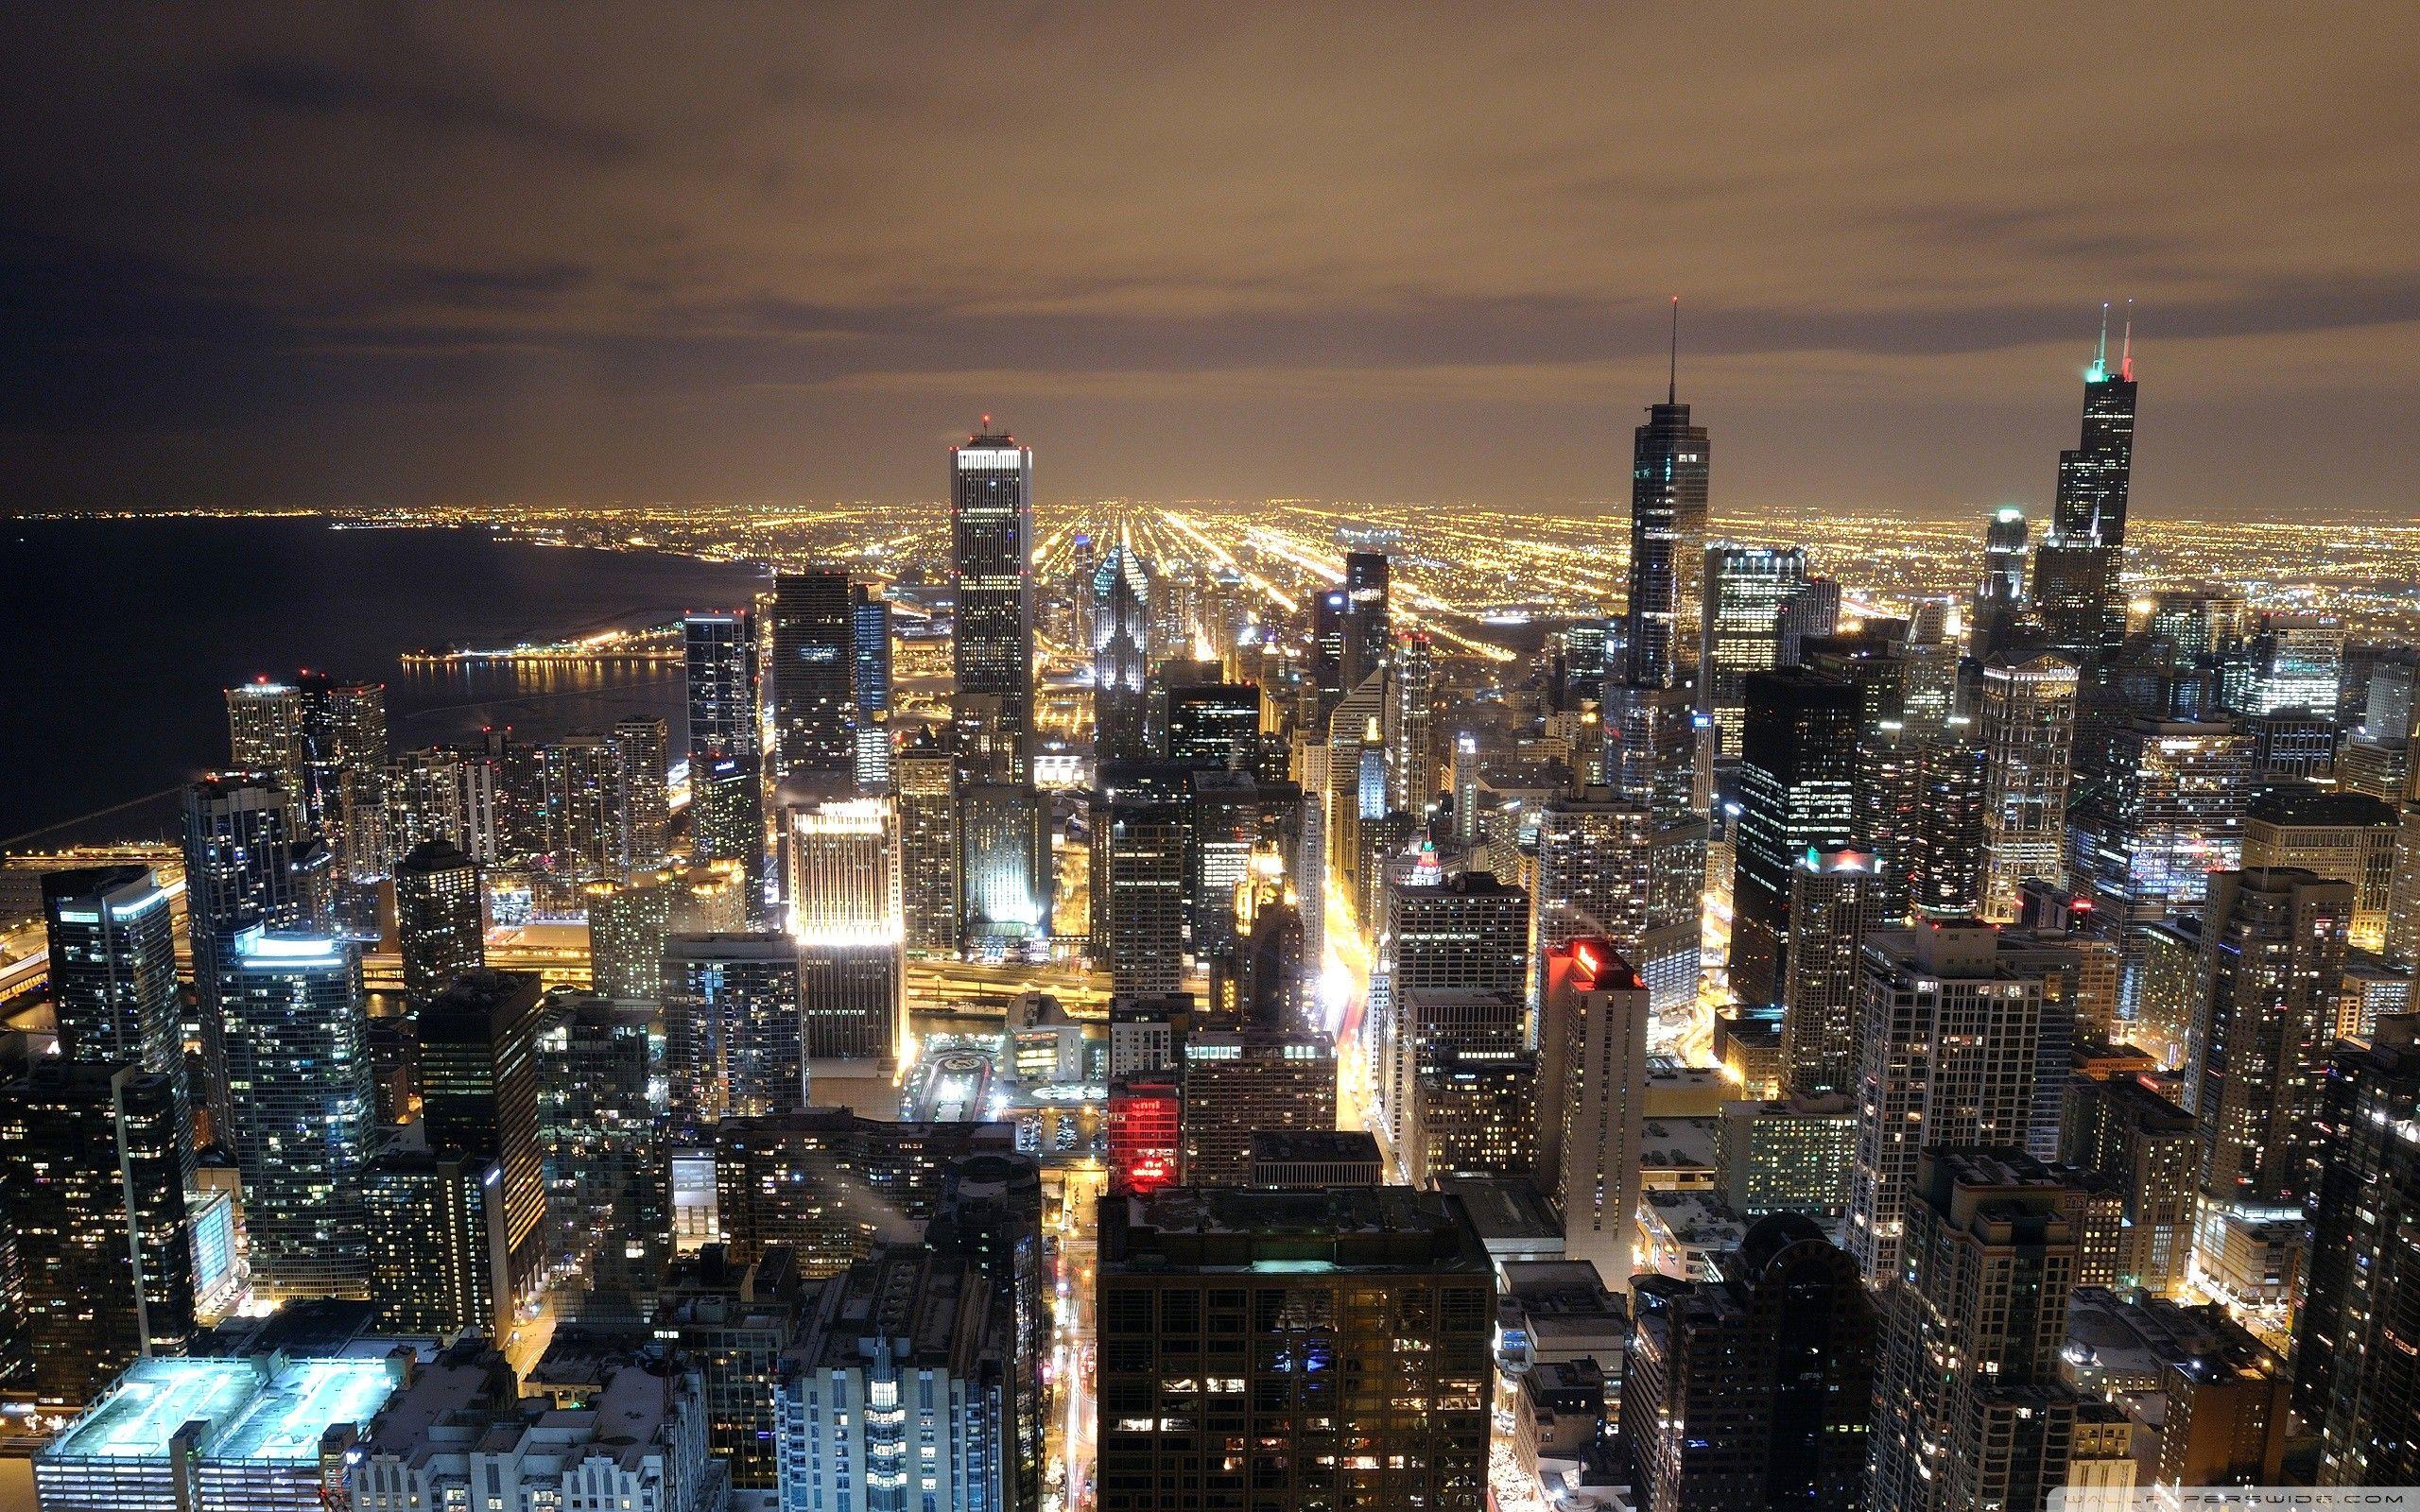 Chicago Skyline Wallpaper 4k In 2020 Chicago Hotels Chicago Wallpaper Chicago At Night